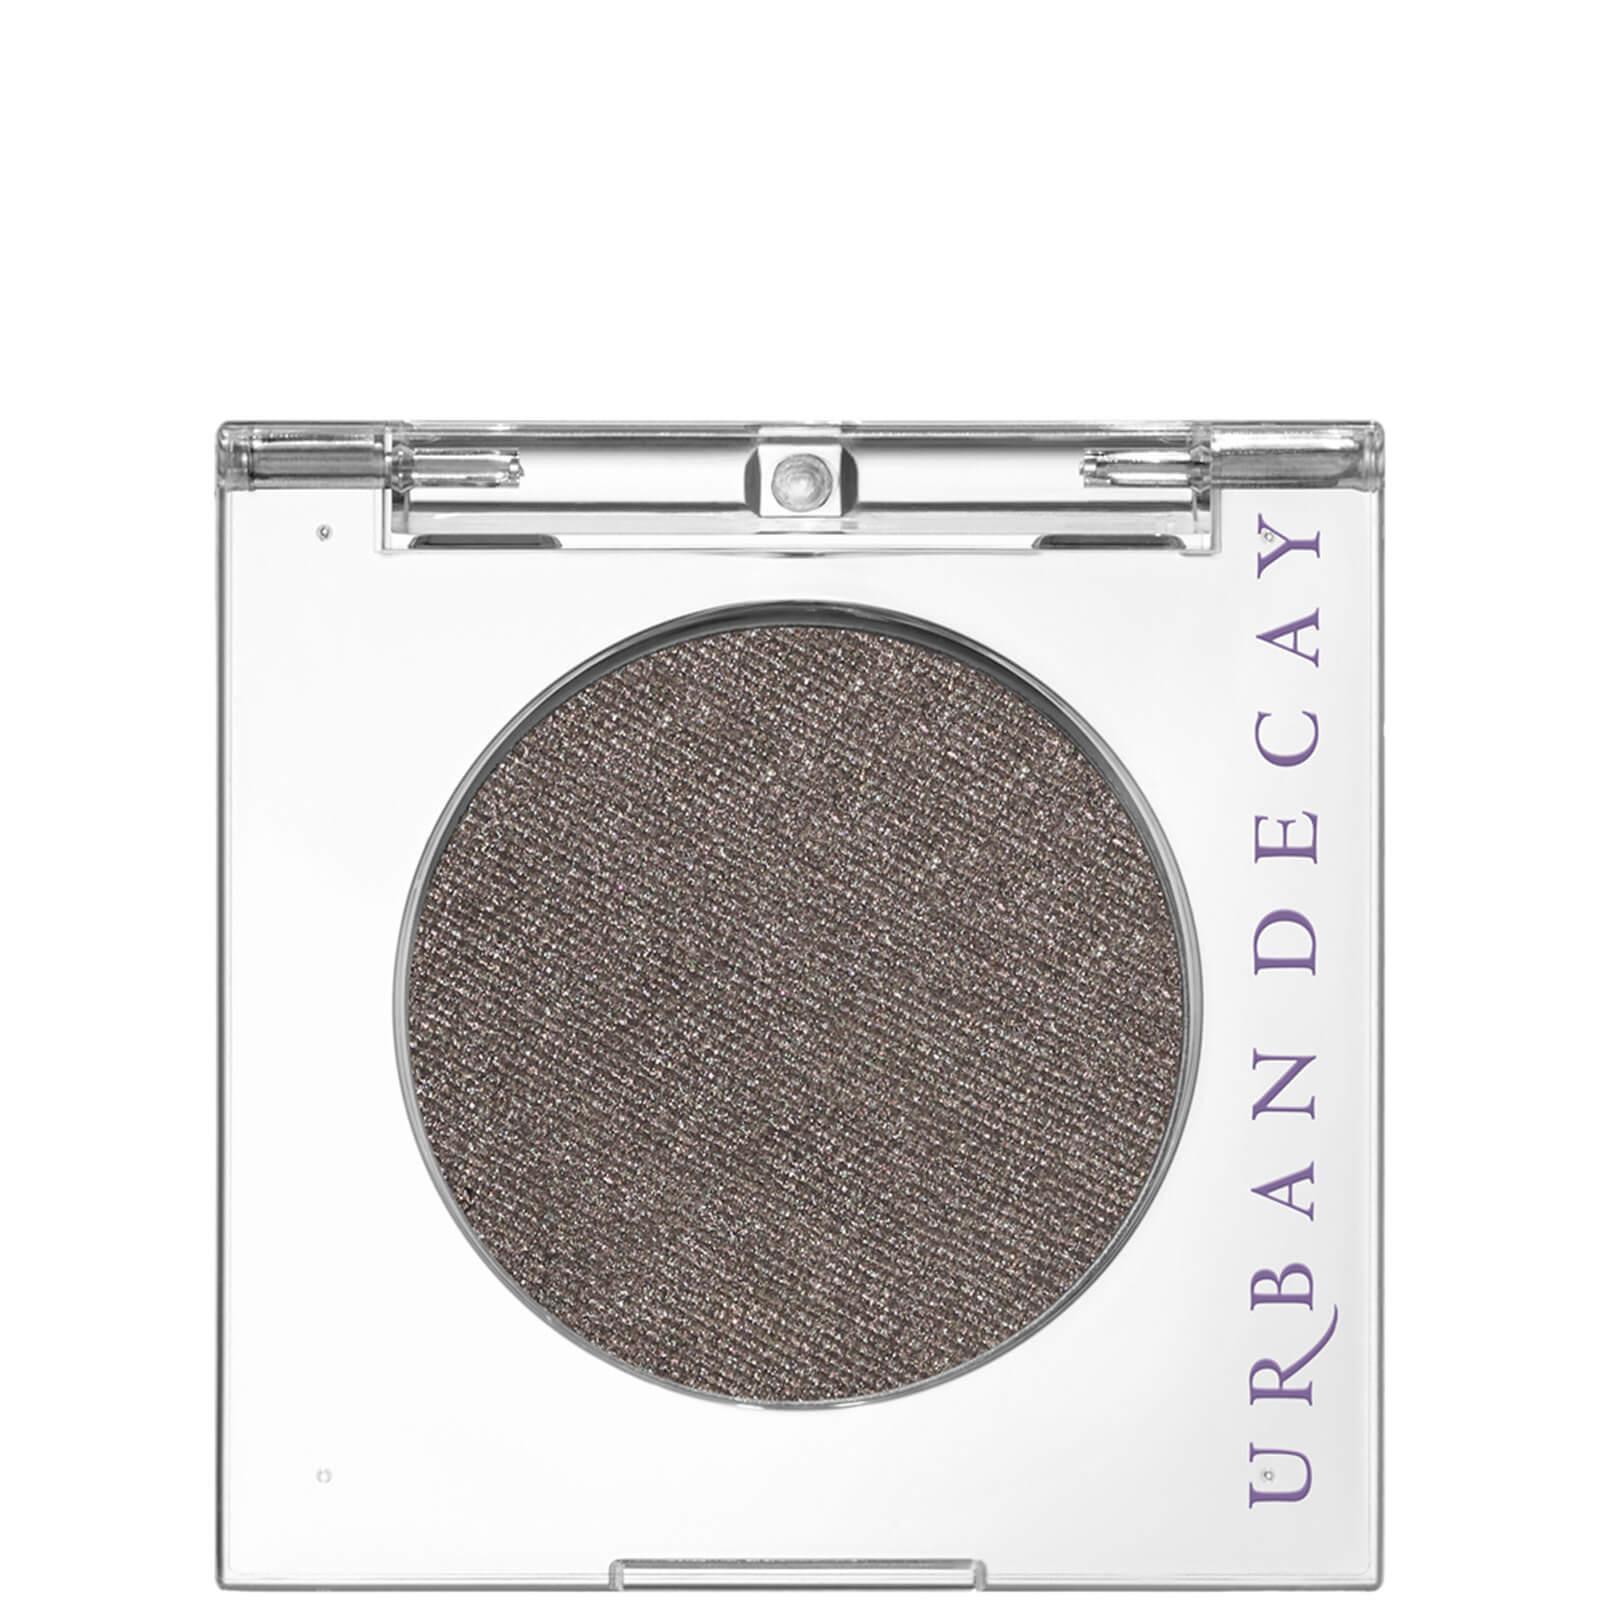 Купить Urban Decay 24/7 Eyeshadow Mono Moondust (Various Shades) - Mushroom